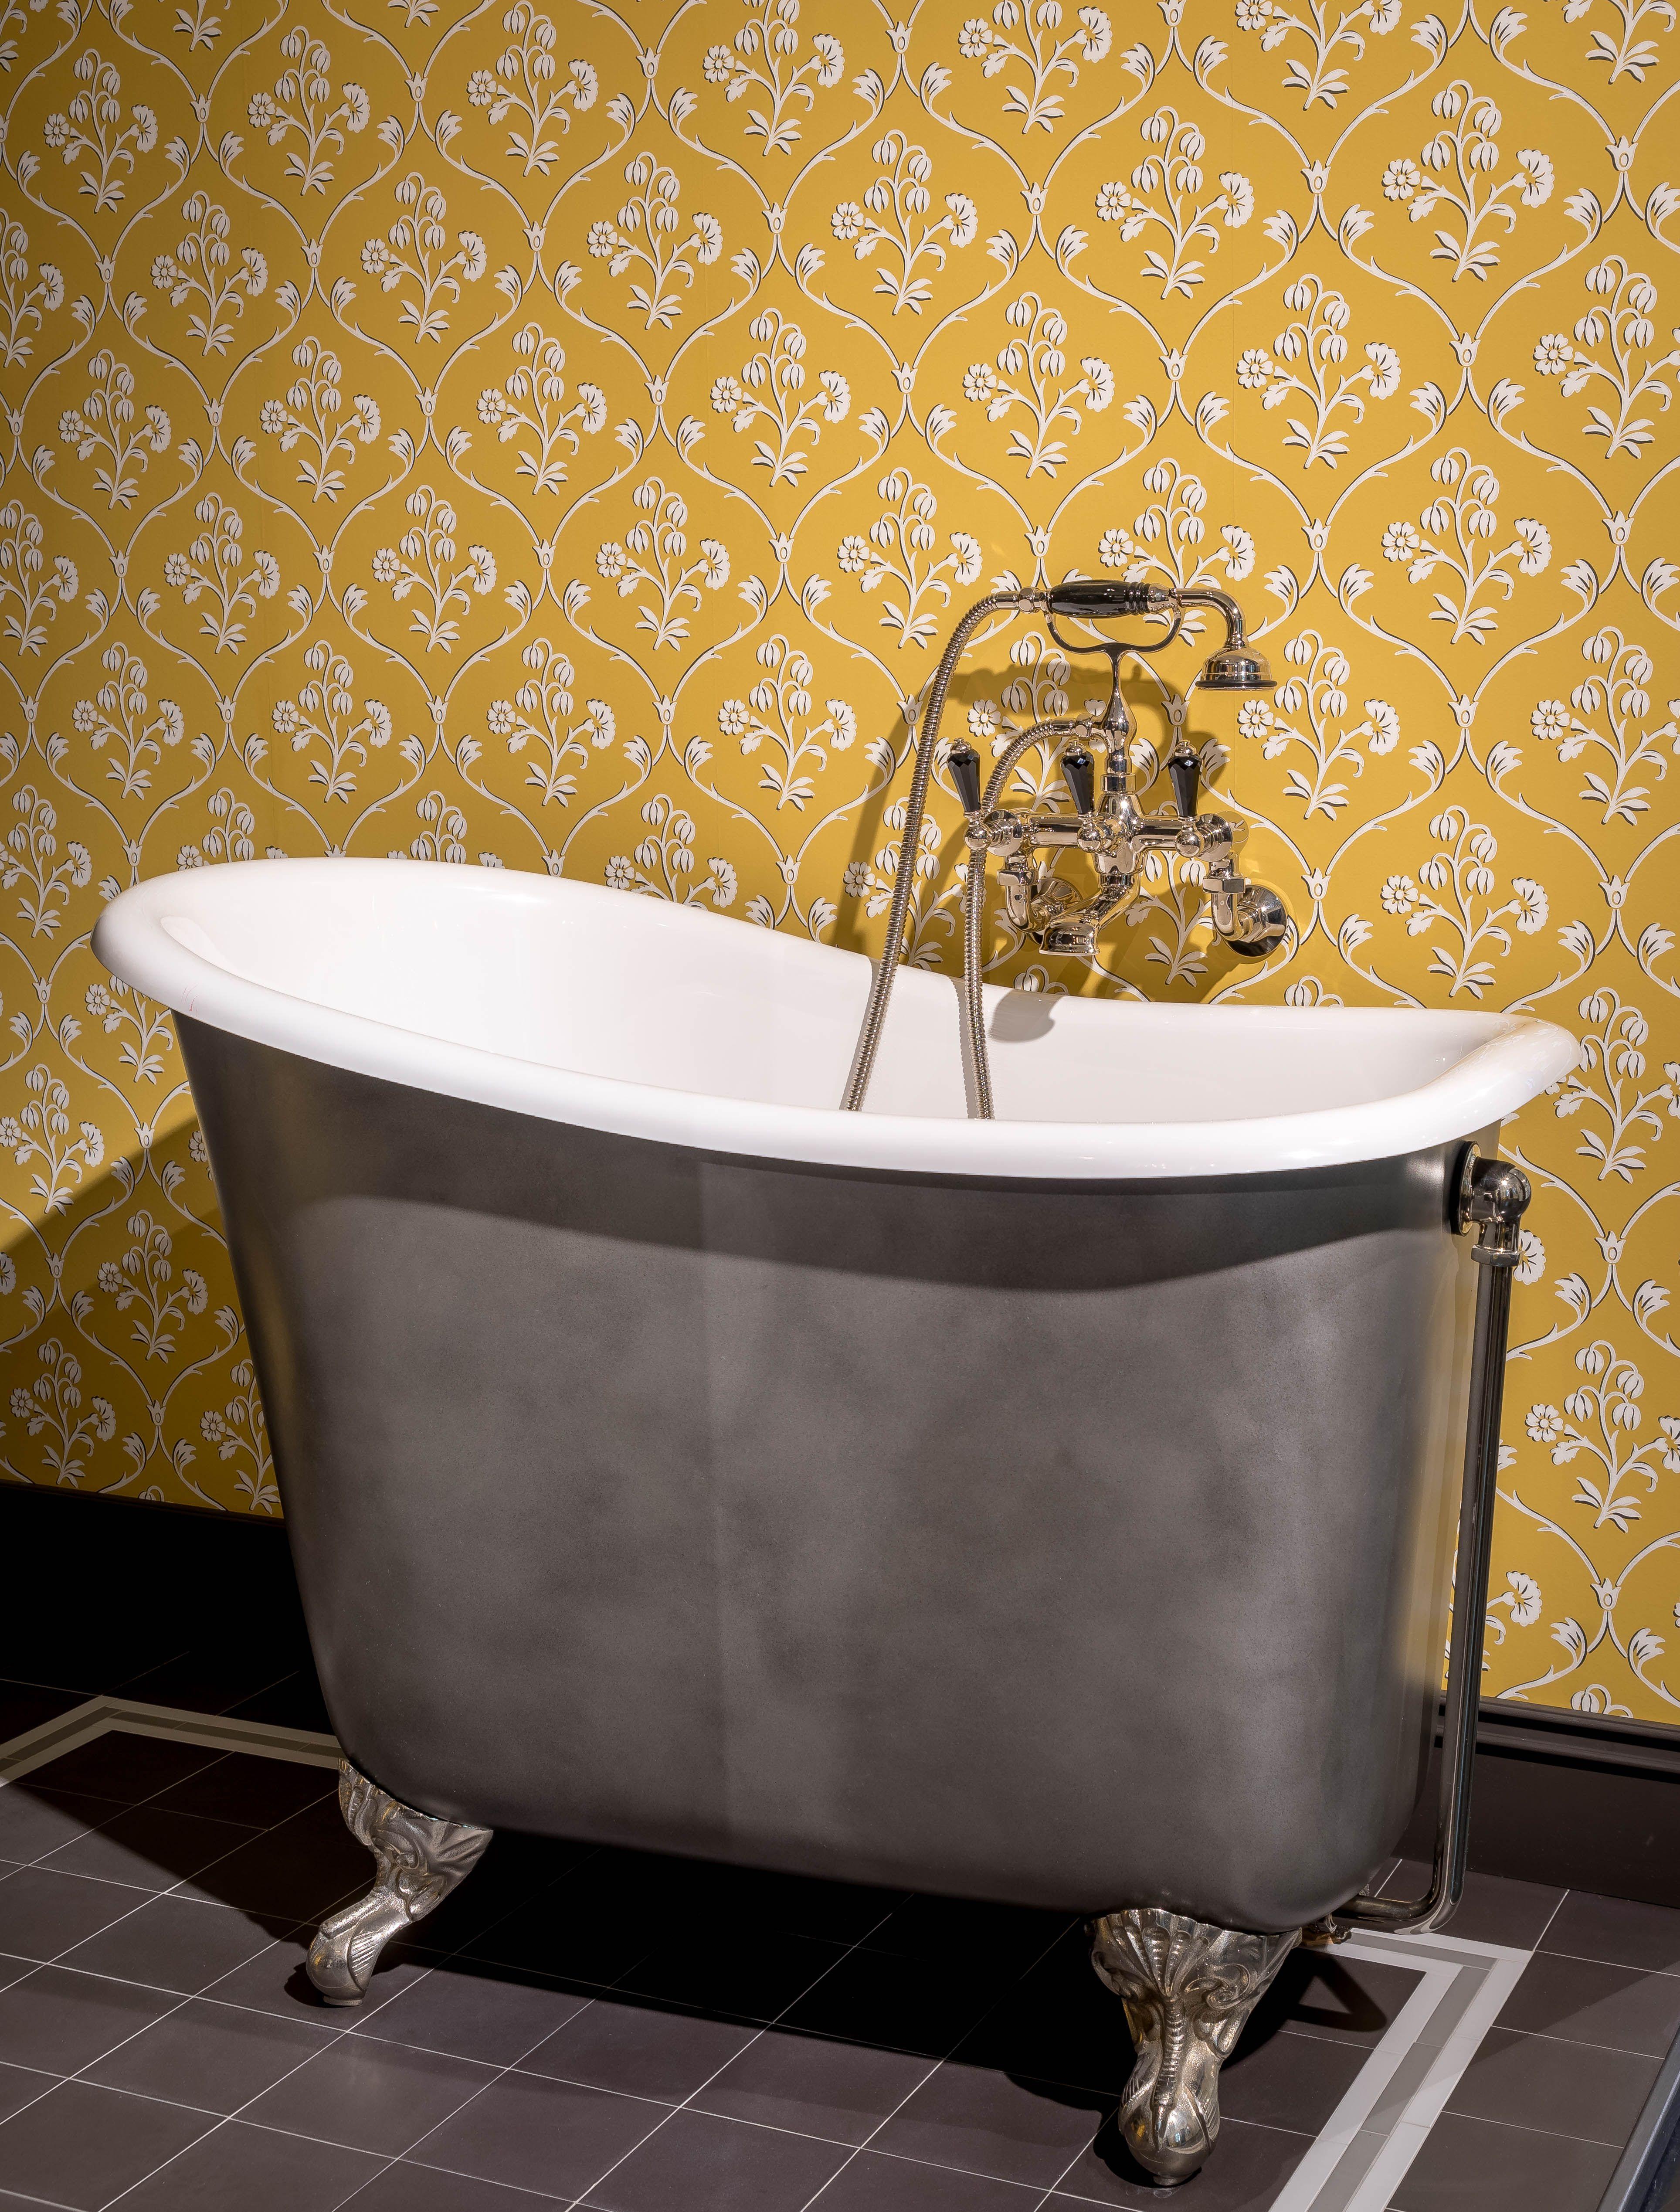 Vintage Badezimmer Traditionelle Bader Badezimmer Gusseisen